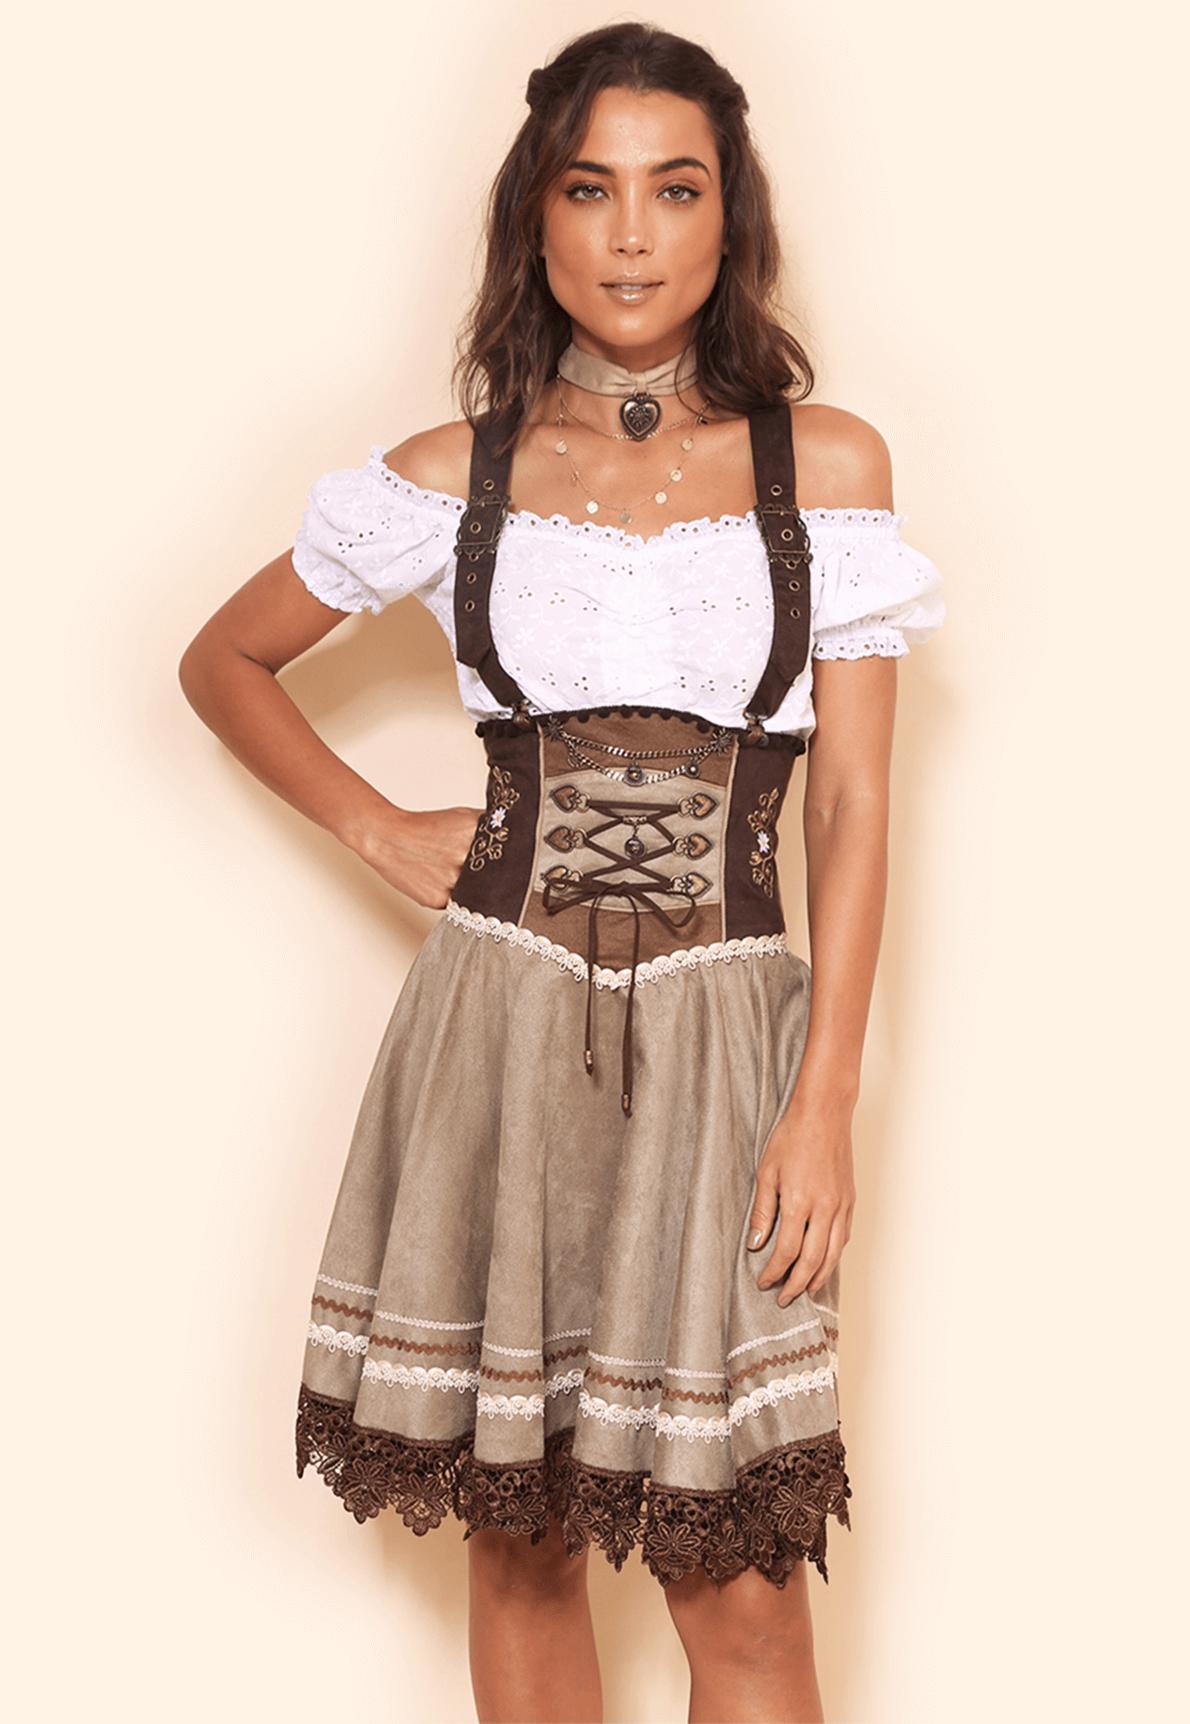 23673-vestido-mayla-marrom-branco-mundo-lolita-01